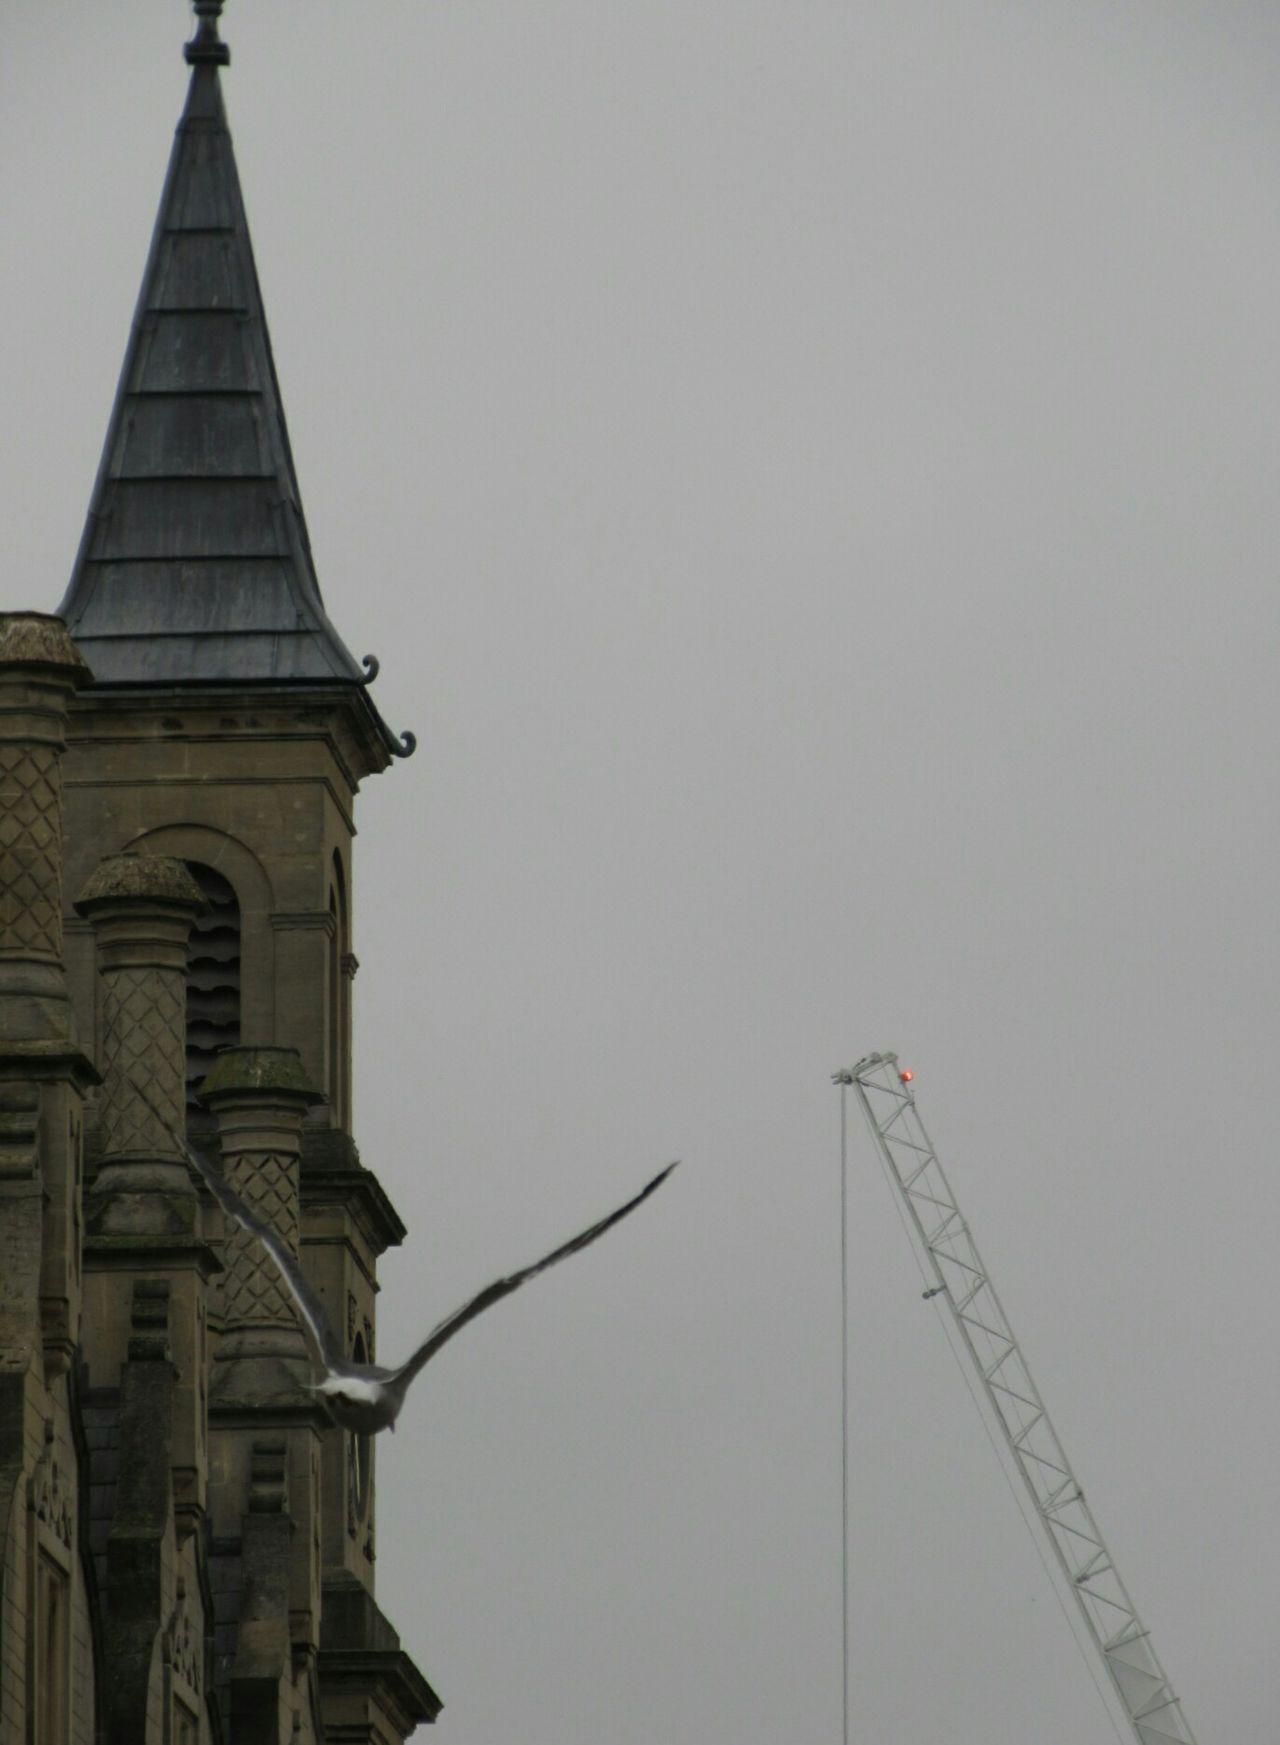 Flying by SEAGULL IN FLIGHT Bird Bird Photography Church Buildings Church TowerChurch Architecture Construction Crane Grey Sky Bath England